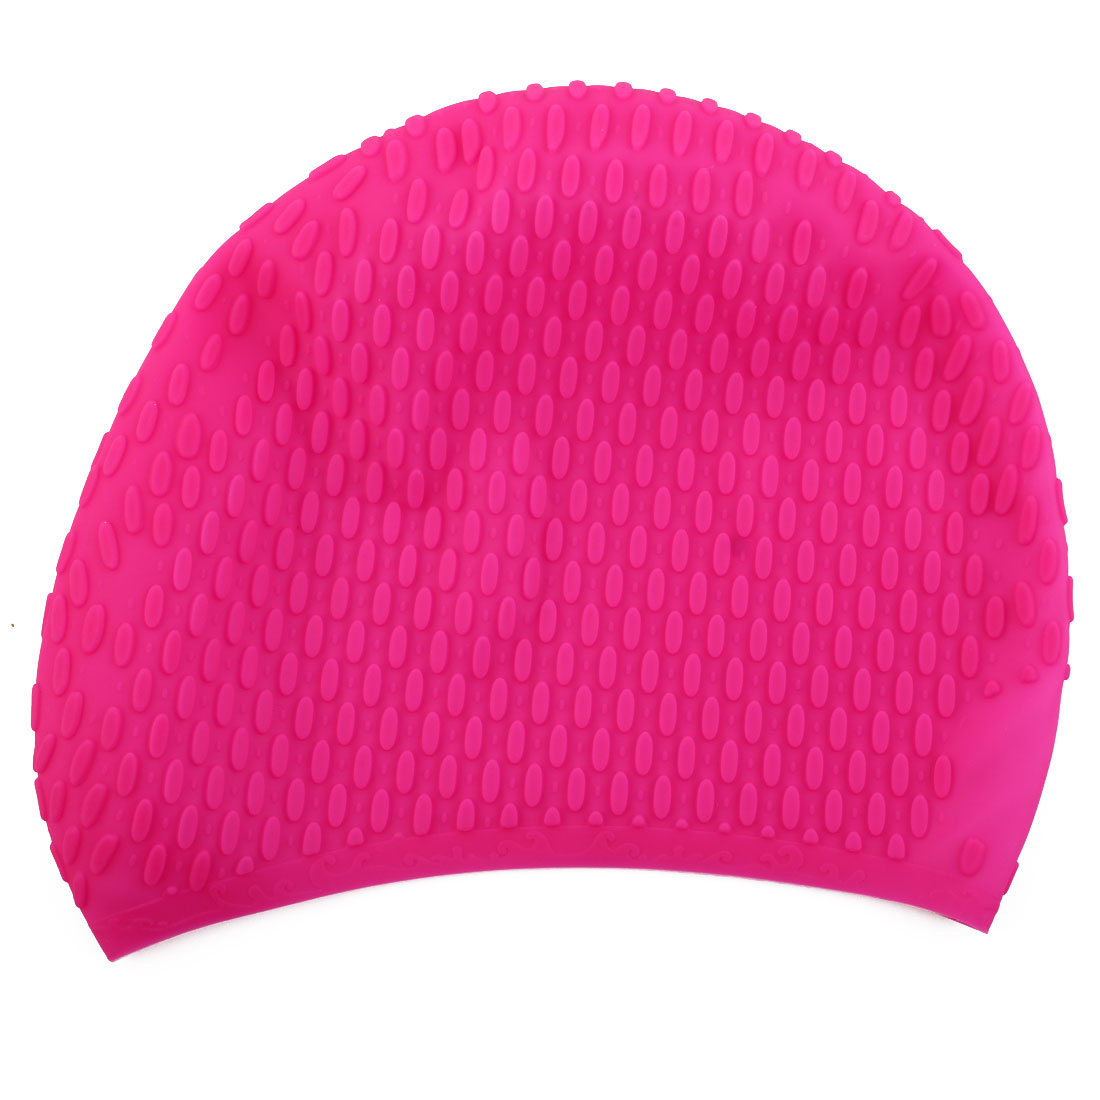 Adult Unisex Silicone Dome Shape Anti-slip Elastic Swimming Cap Underwater Bathing Hat Fuchsia